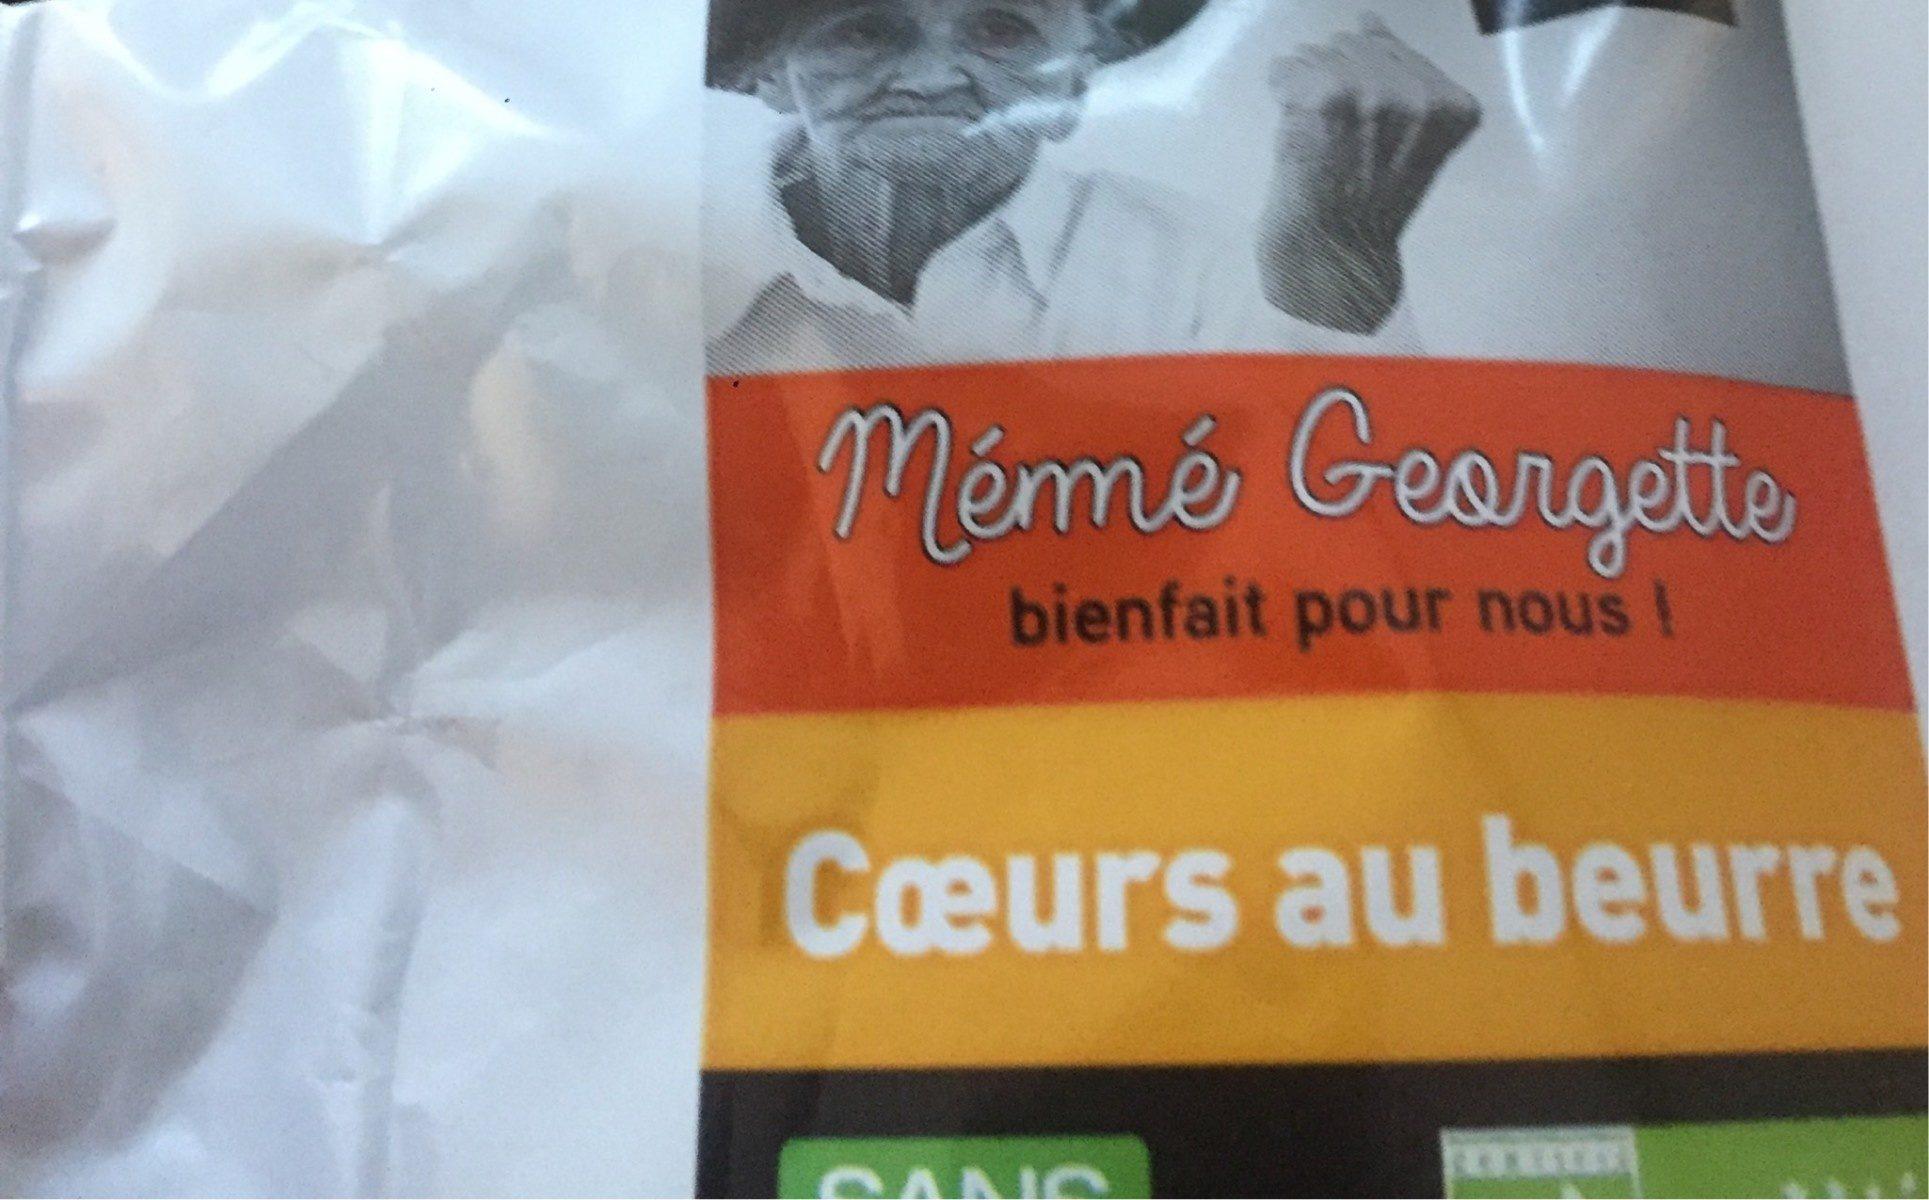 Coeurs au beurre - Product - fr